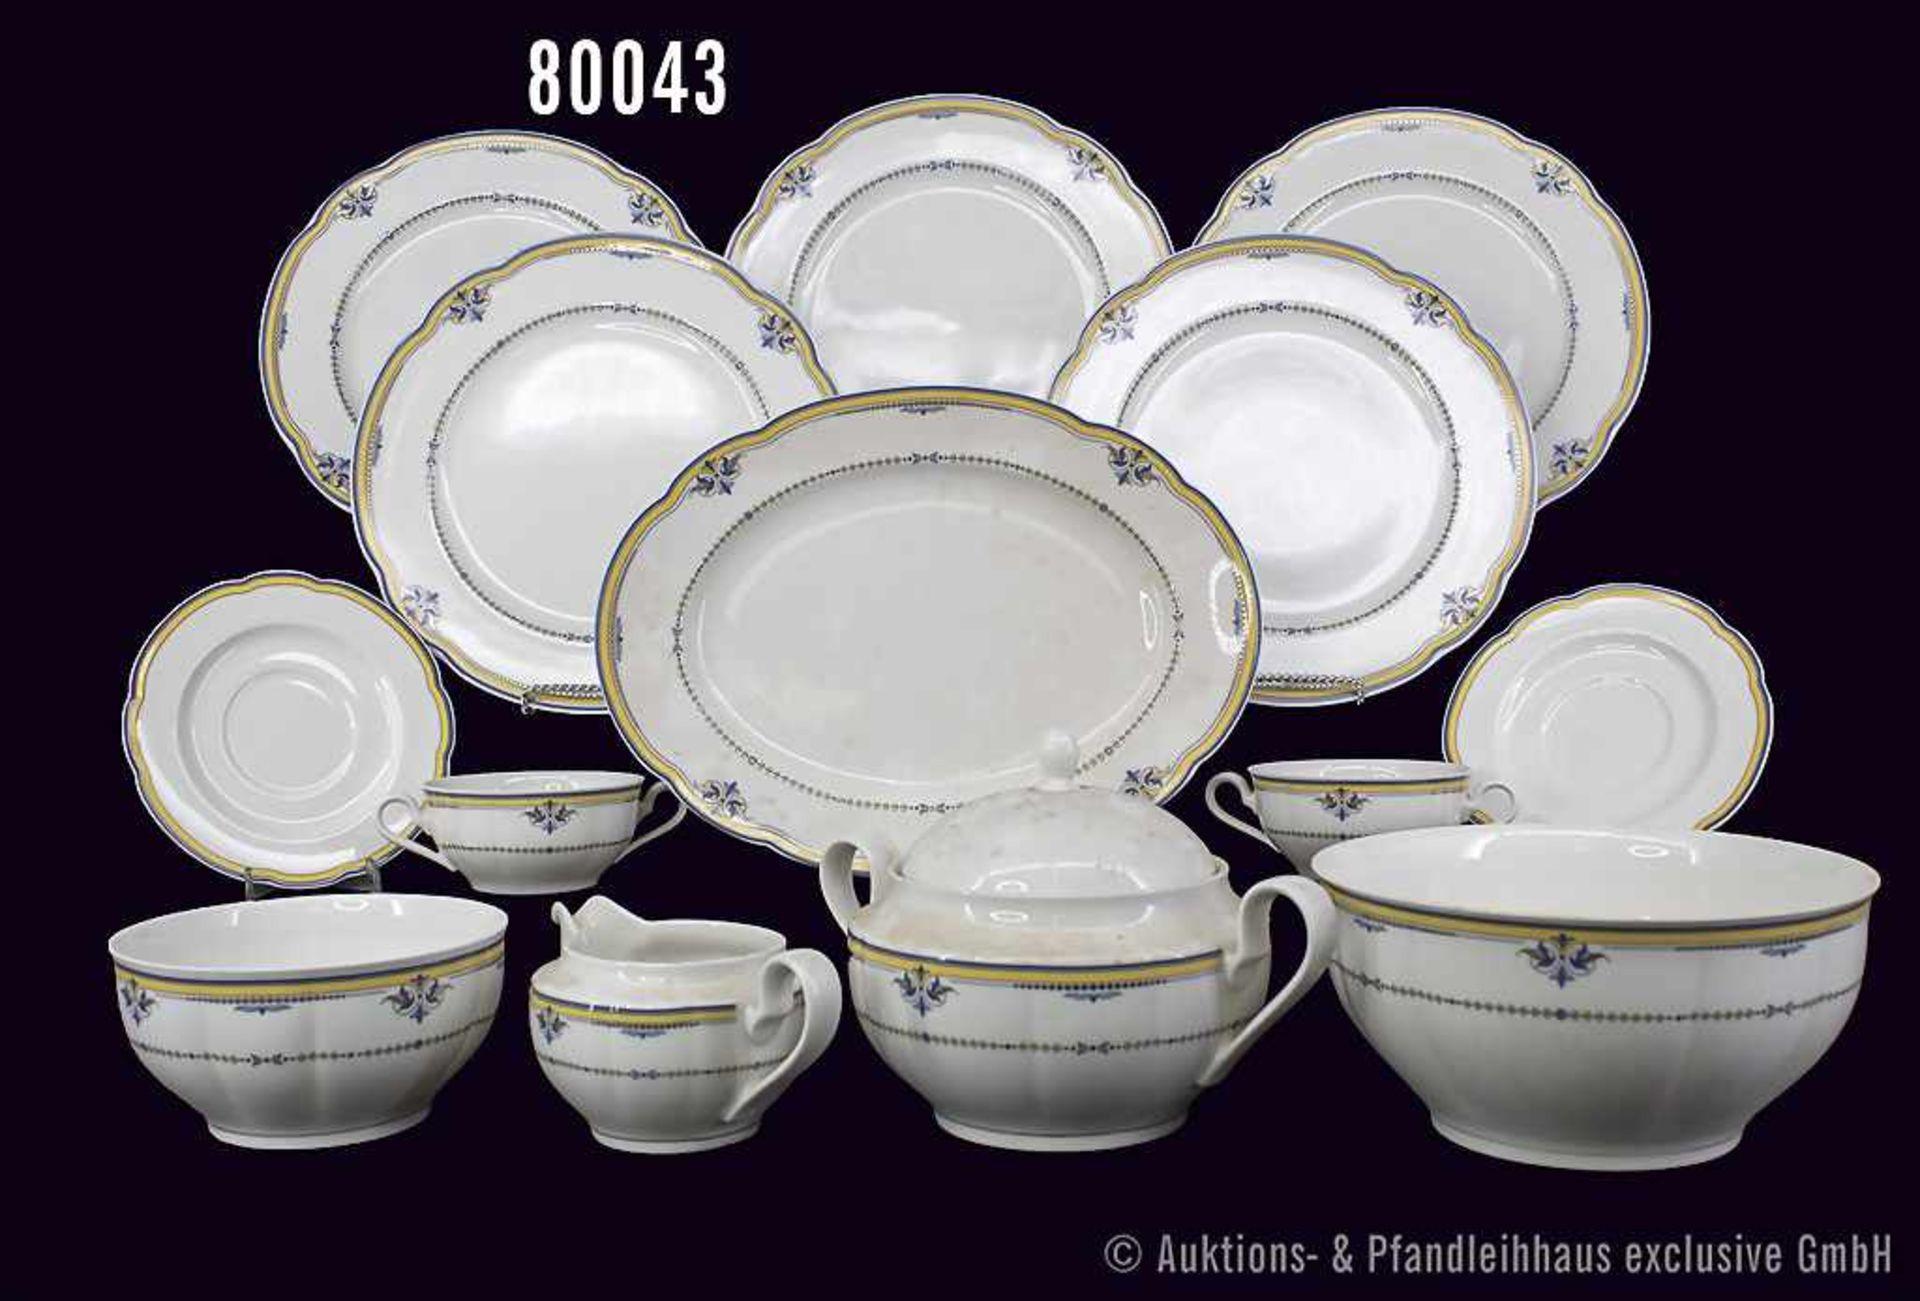 Konv. Rosenthal Porzellan, 23 Teile, Rosenthal classic, Pearl China, Serie Grace, Dekor